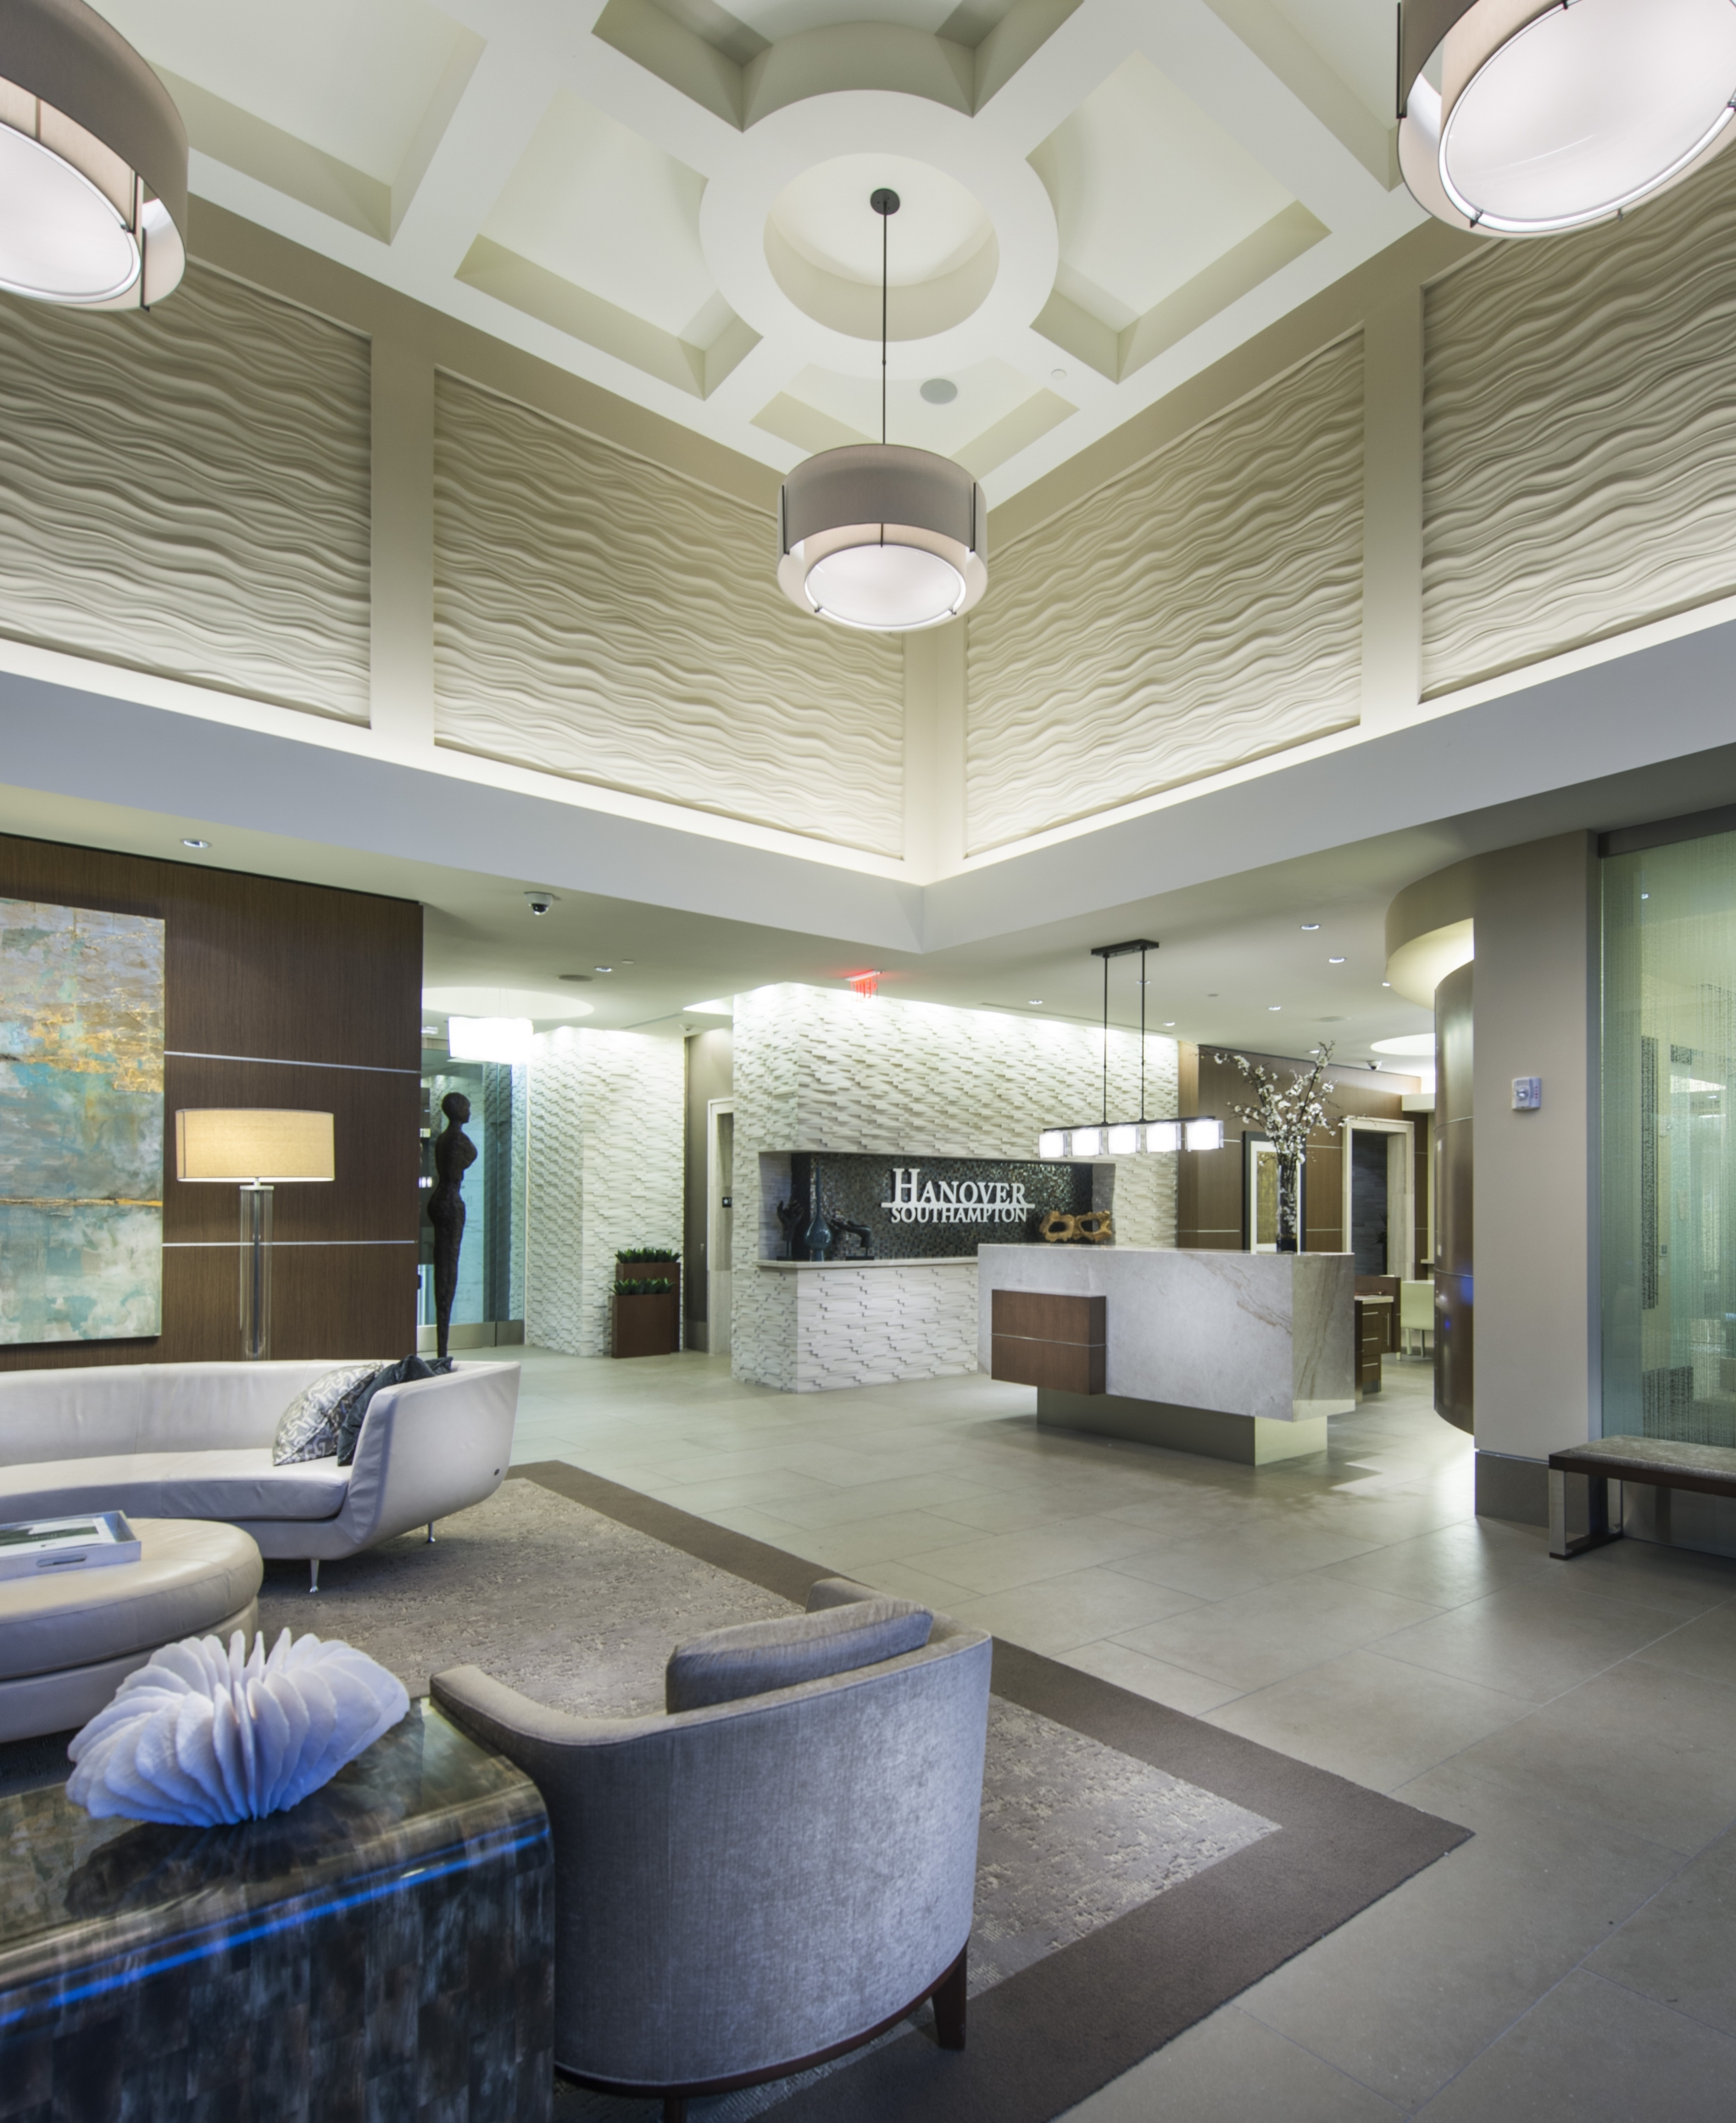 Lobby and seating area at Hanover Southampton